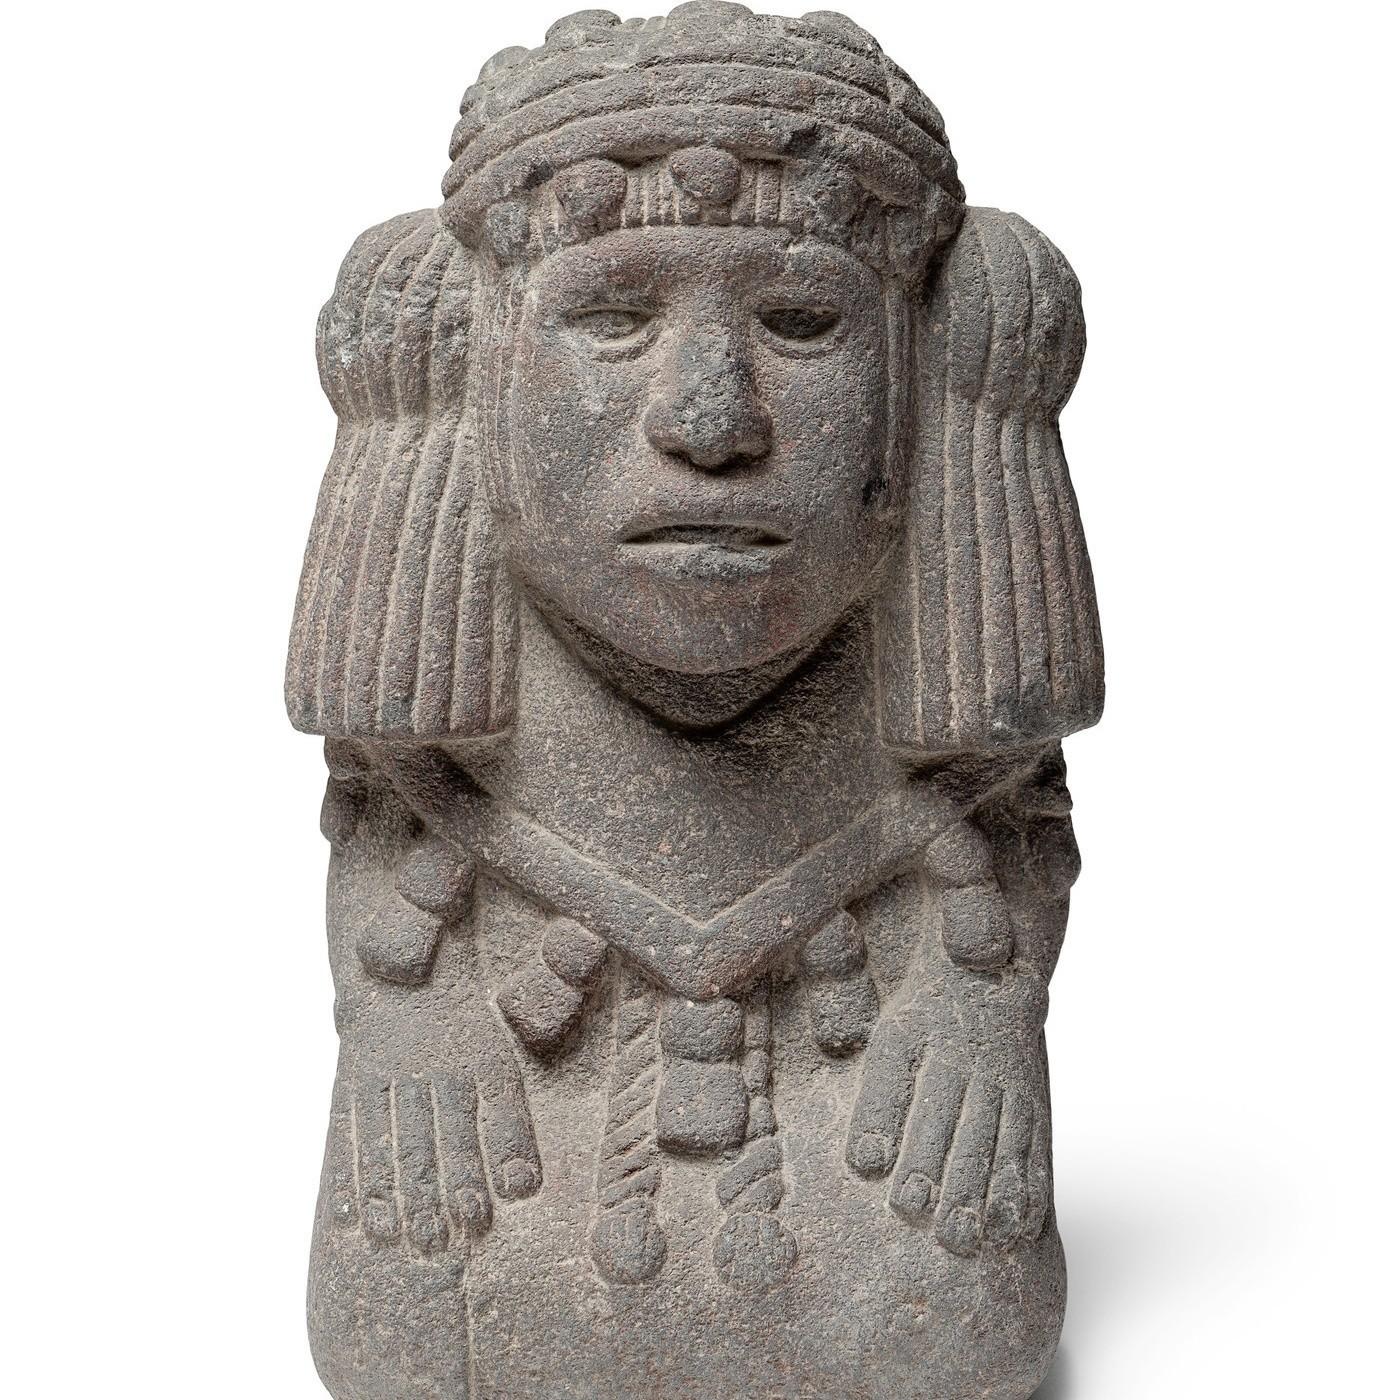 Water deity (Chalchiuhtlicue), Mexico, Aztec, 1200-1521.